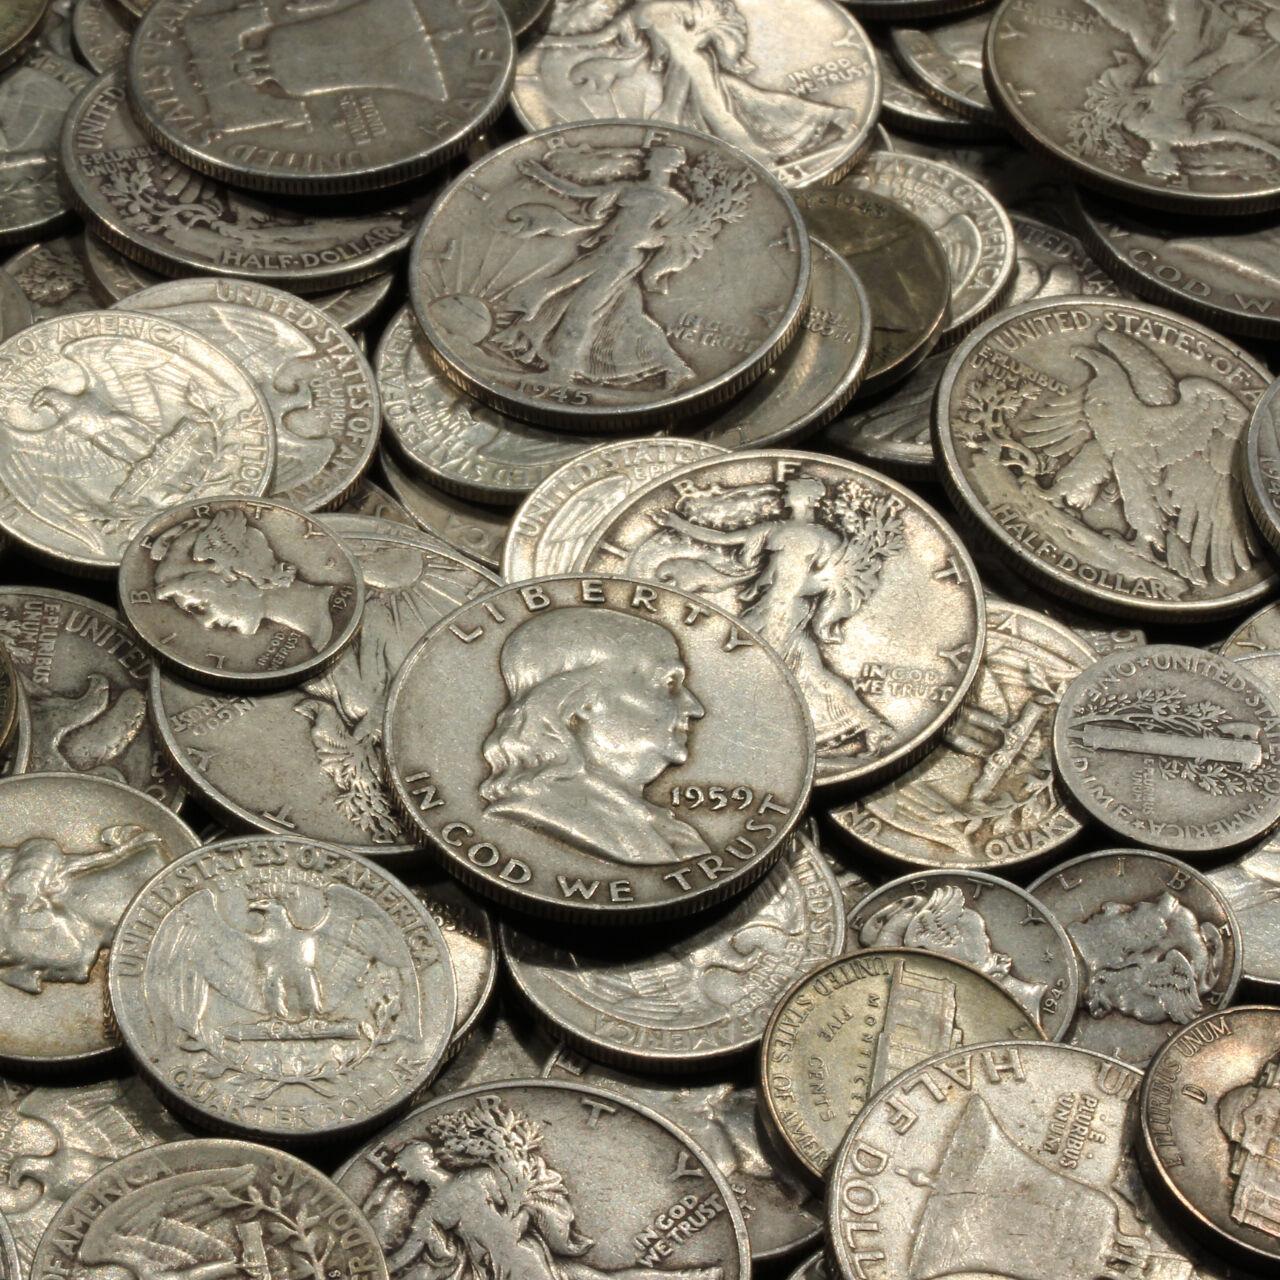 ✯SILVER✯ ONE Troy Pound U.S. Mixed Silver Coins Lot Pre-1965 .999 Bars Bonus!